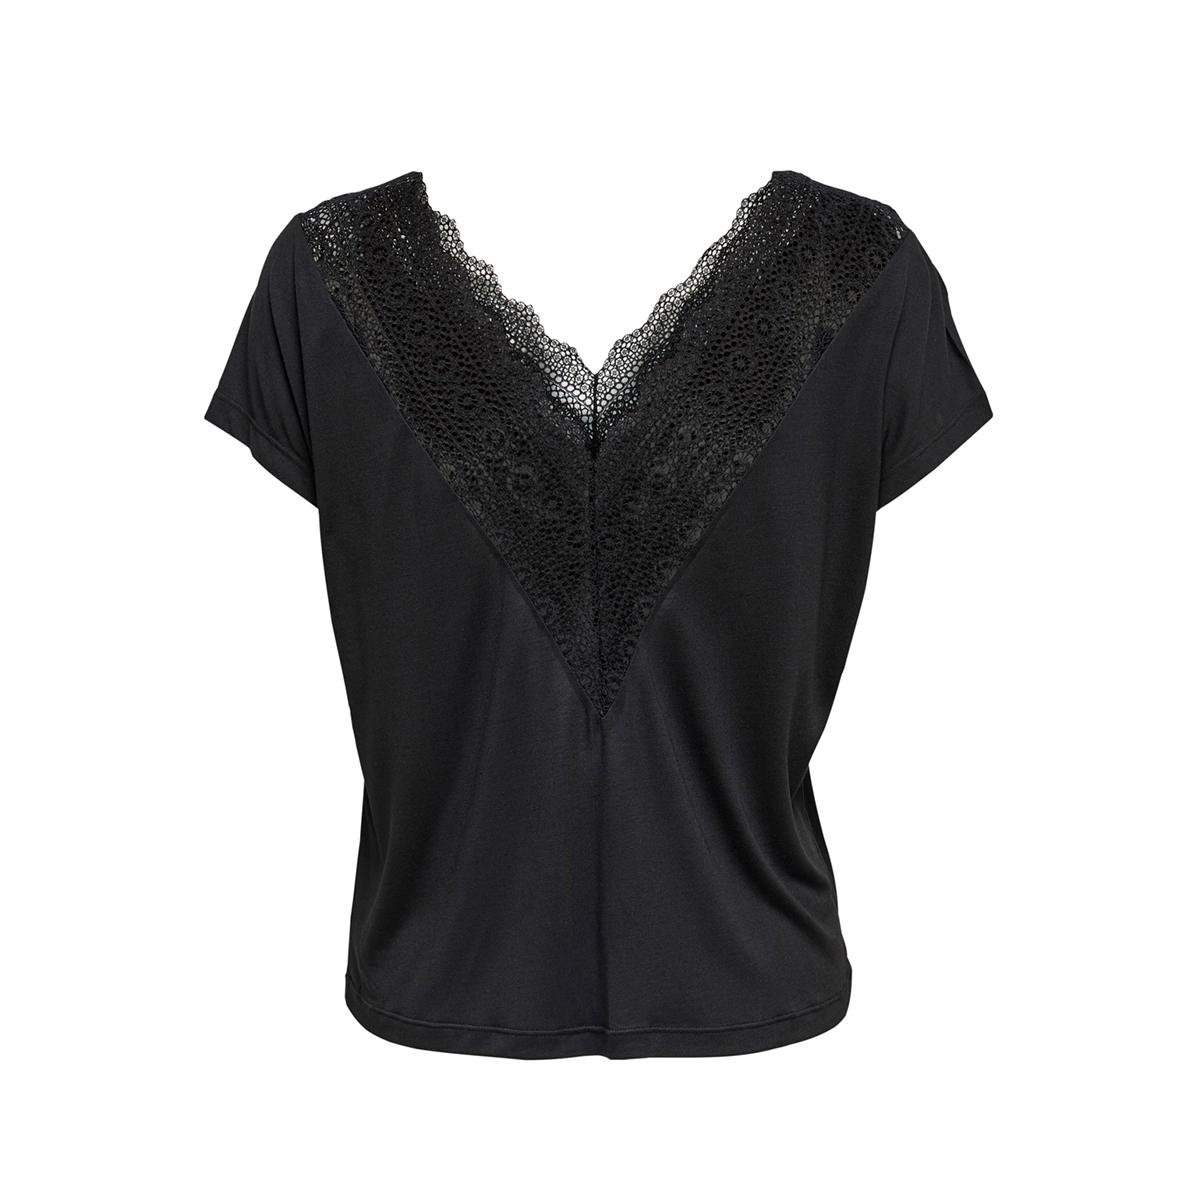 onlblake s/s lace mix top jrs 15214259 only t-shirt black